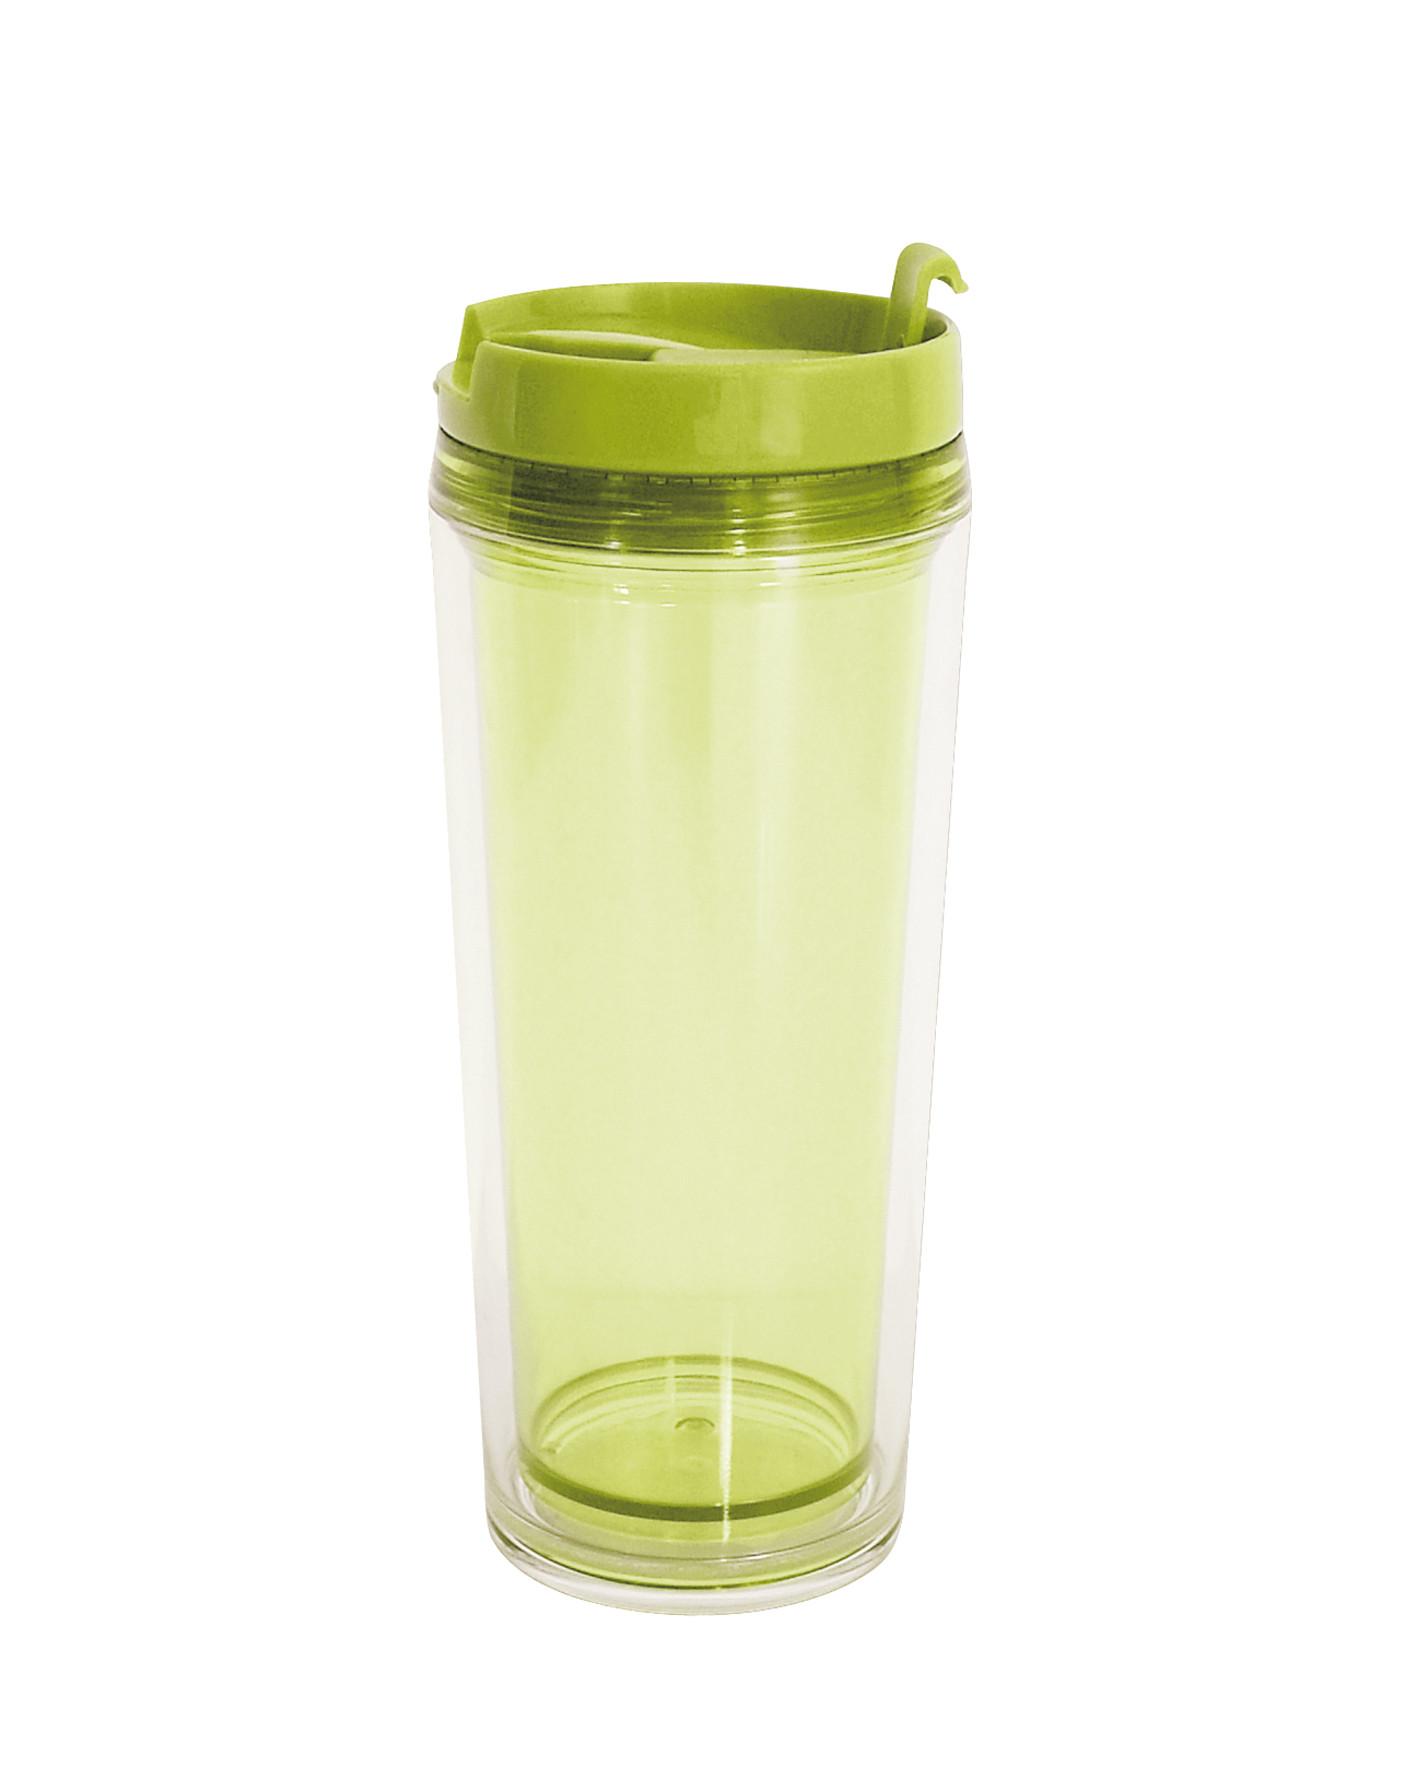 Gob'chaud translucide 20cl - vert